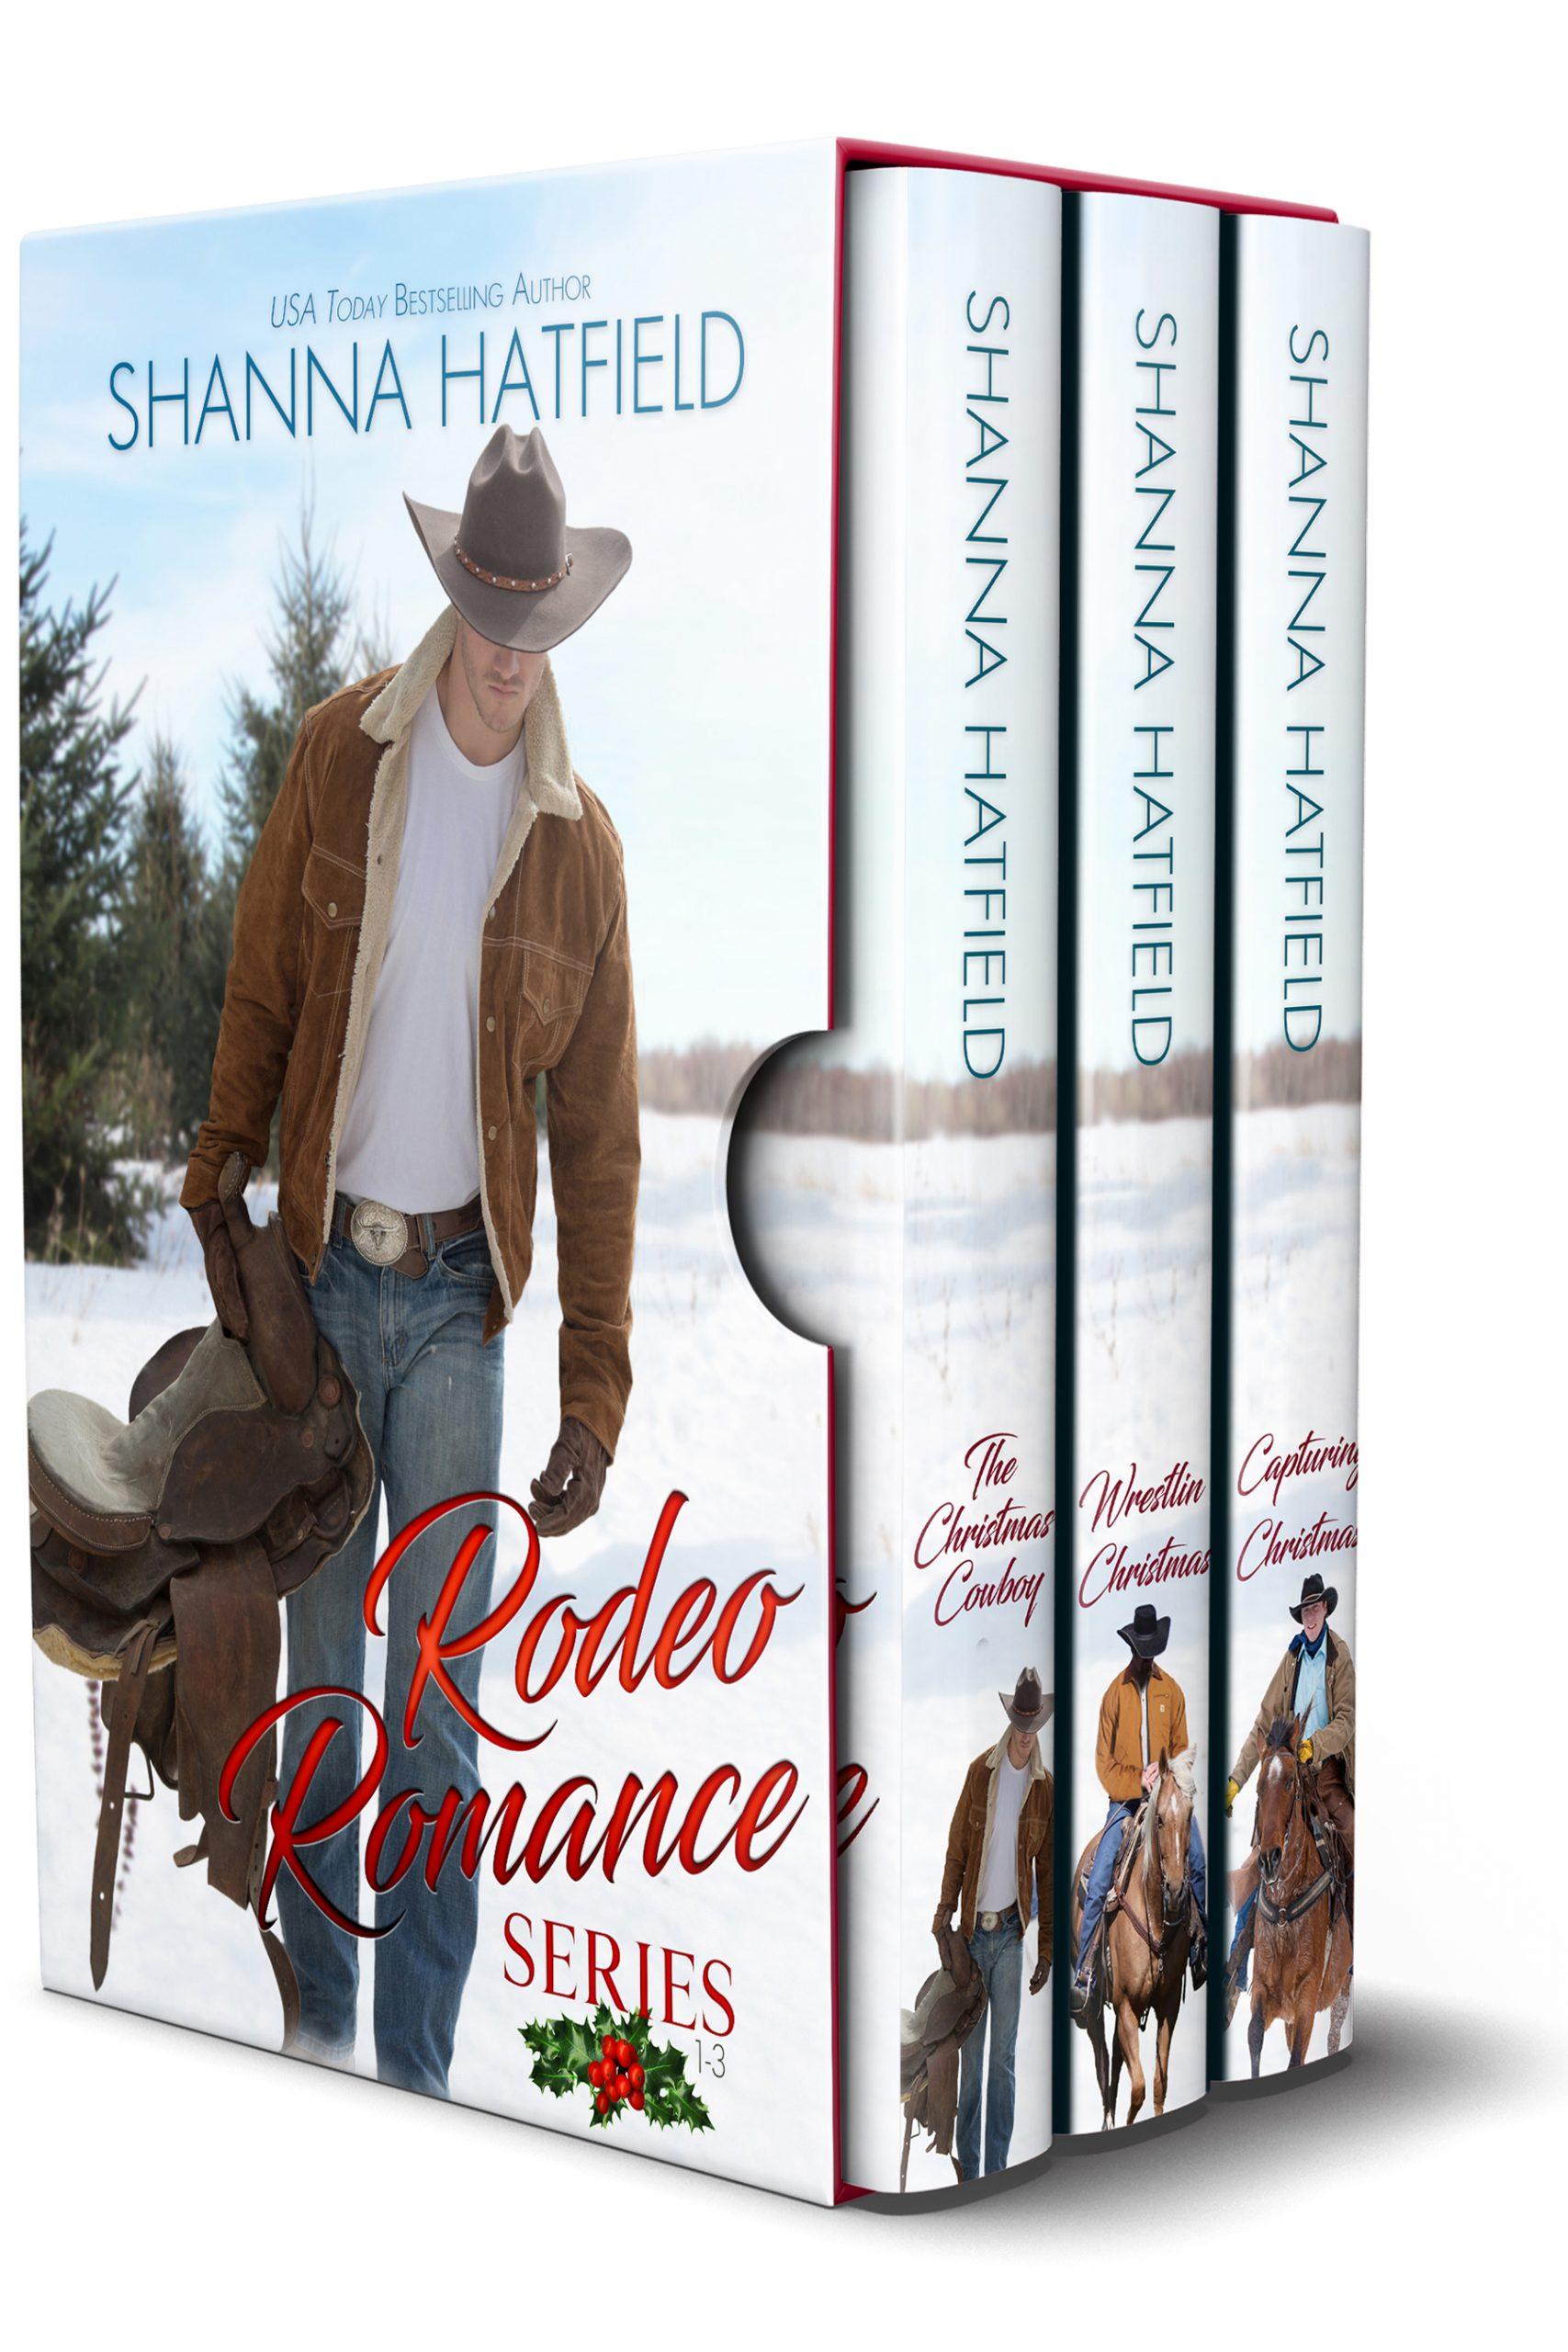 Rodeo Romance three box set 1-3